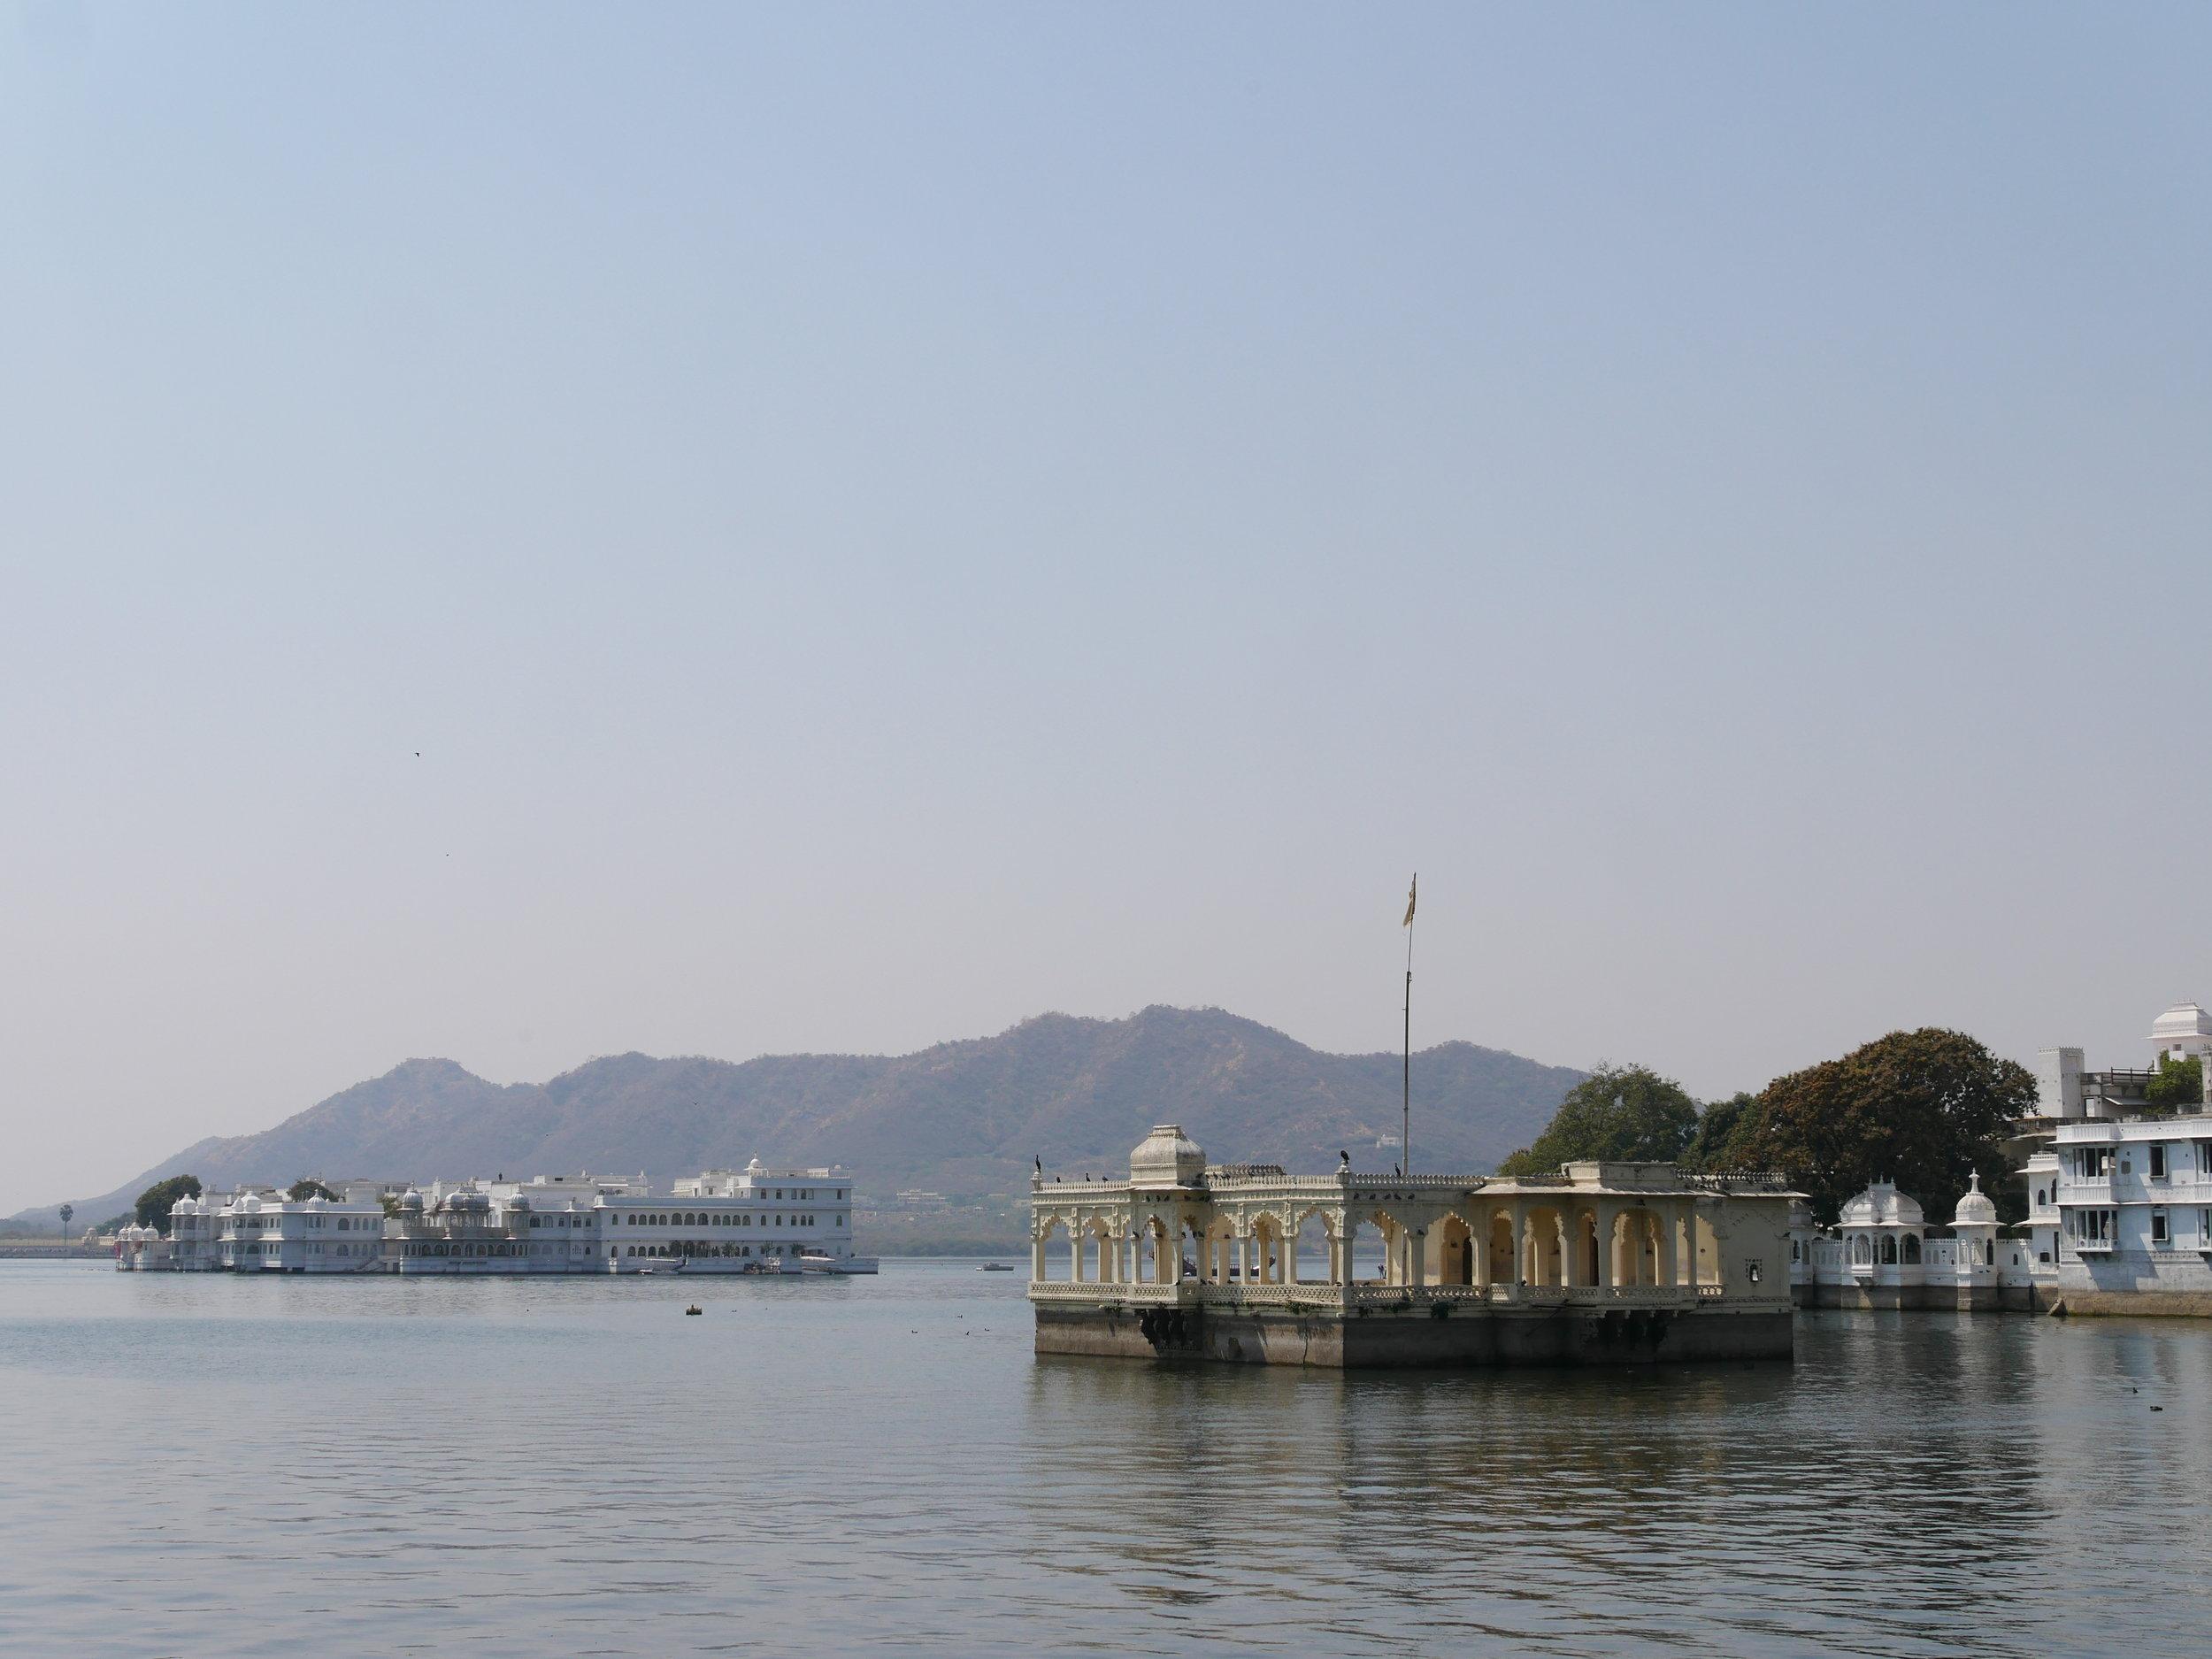 Lake Palace on the left